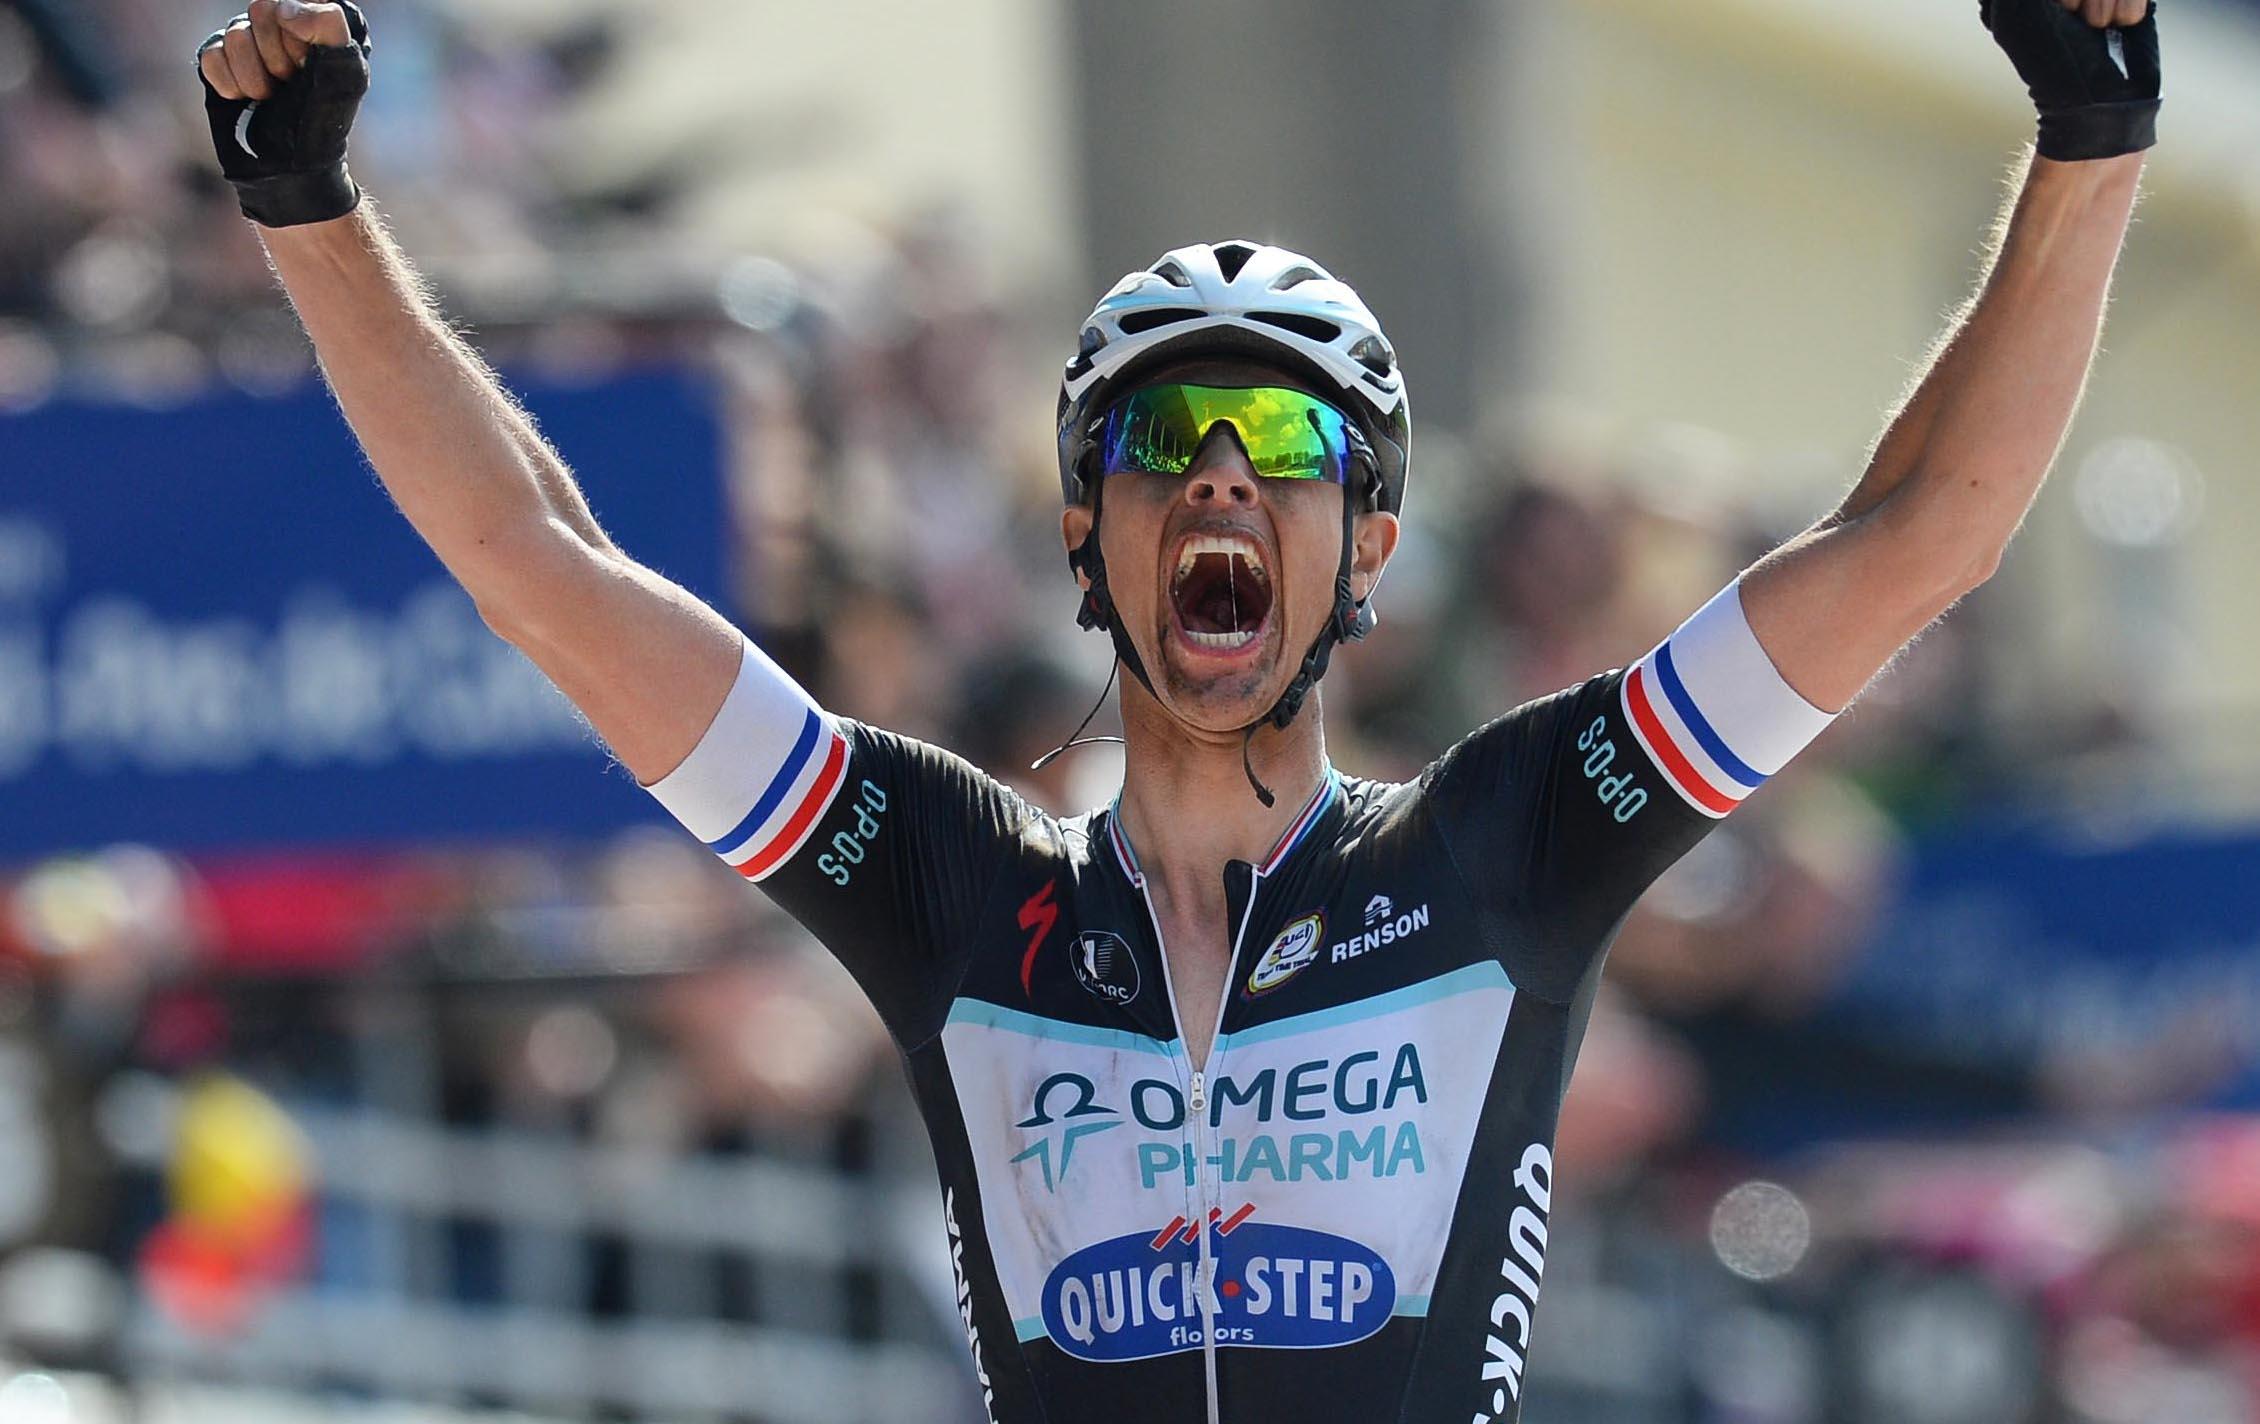 Niki Terpstra (Omega Pharma-Quick Step) gewinnt Paris-Roubaix